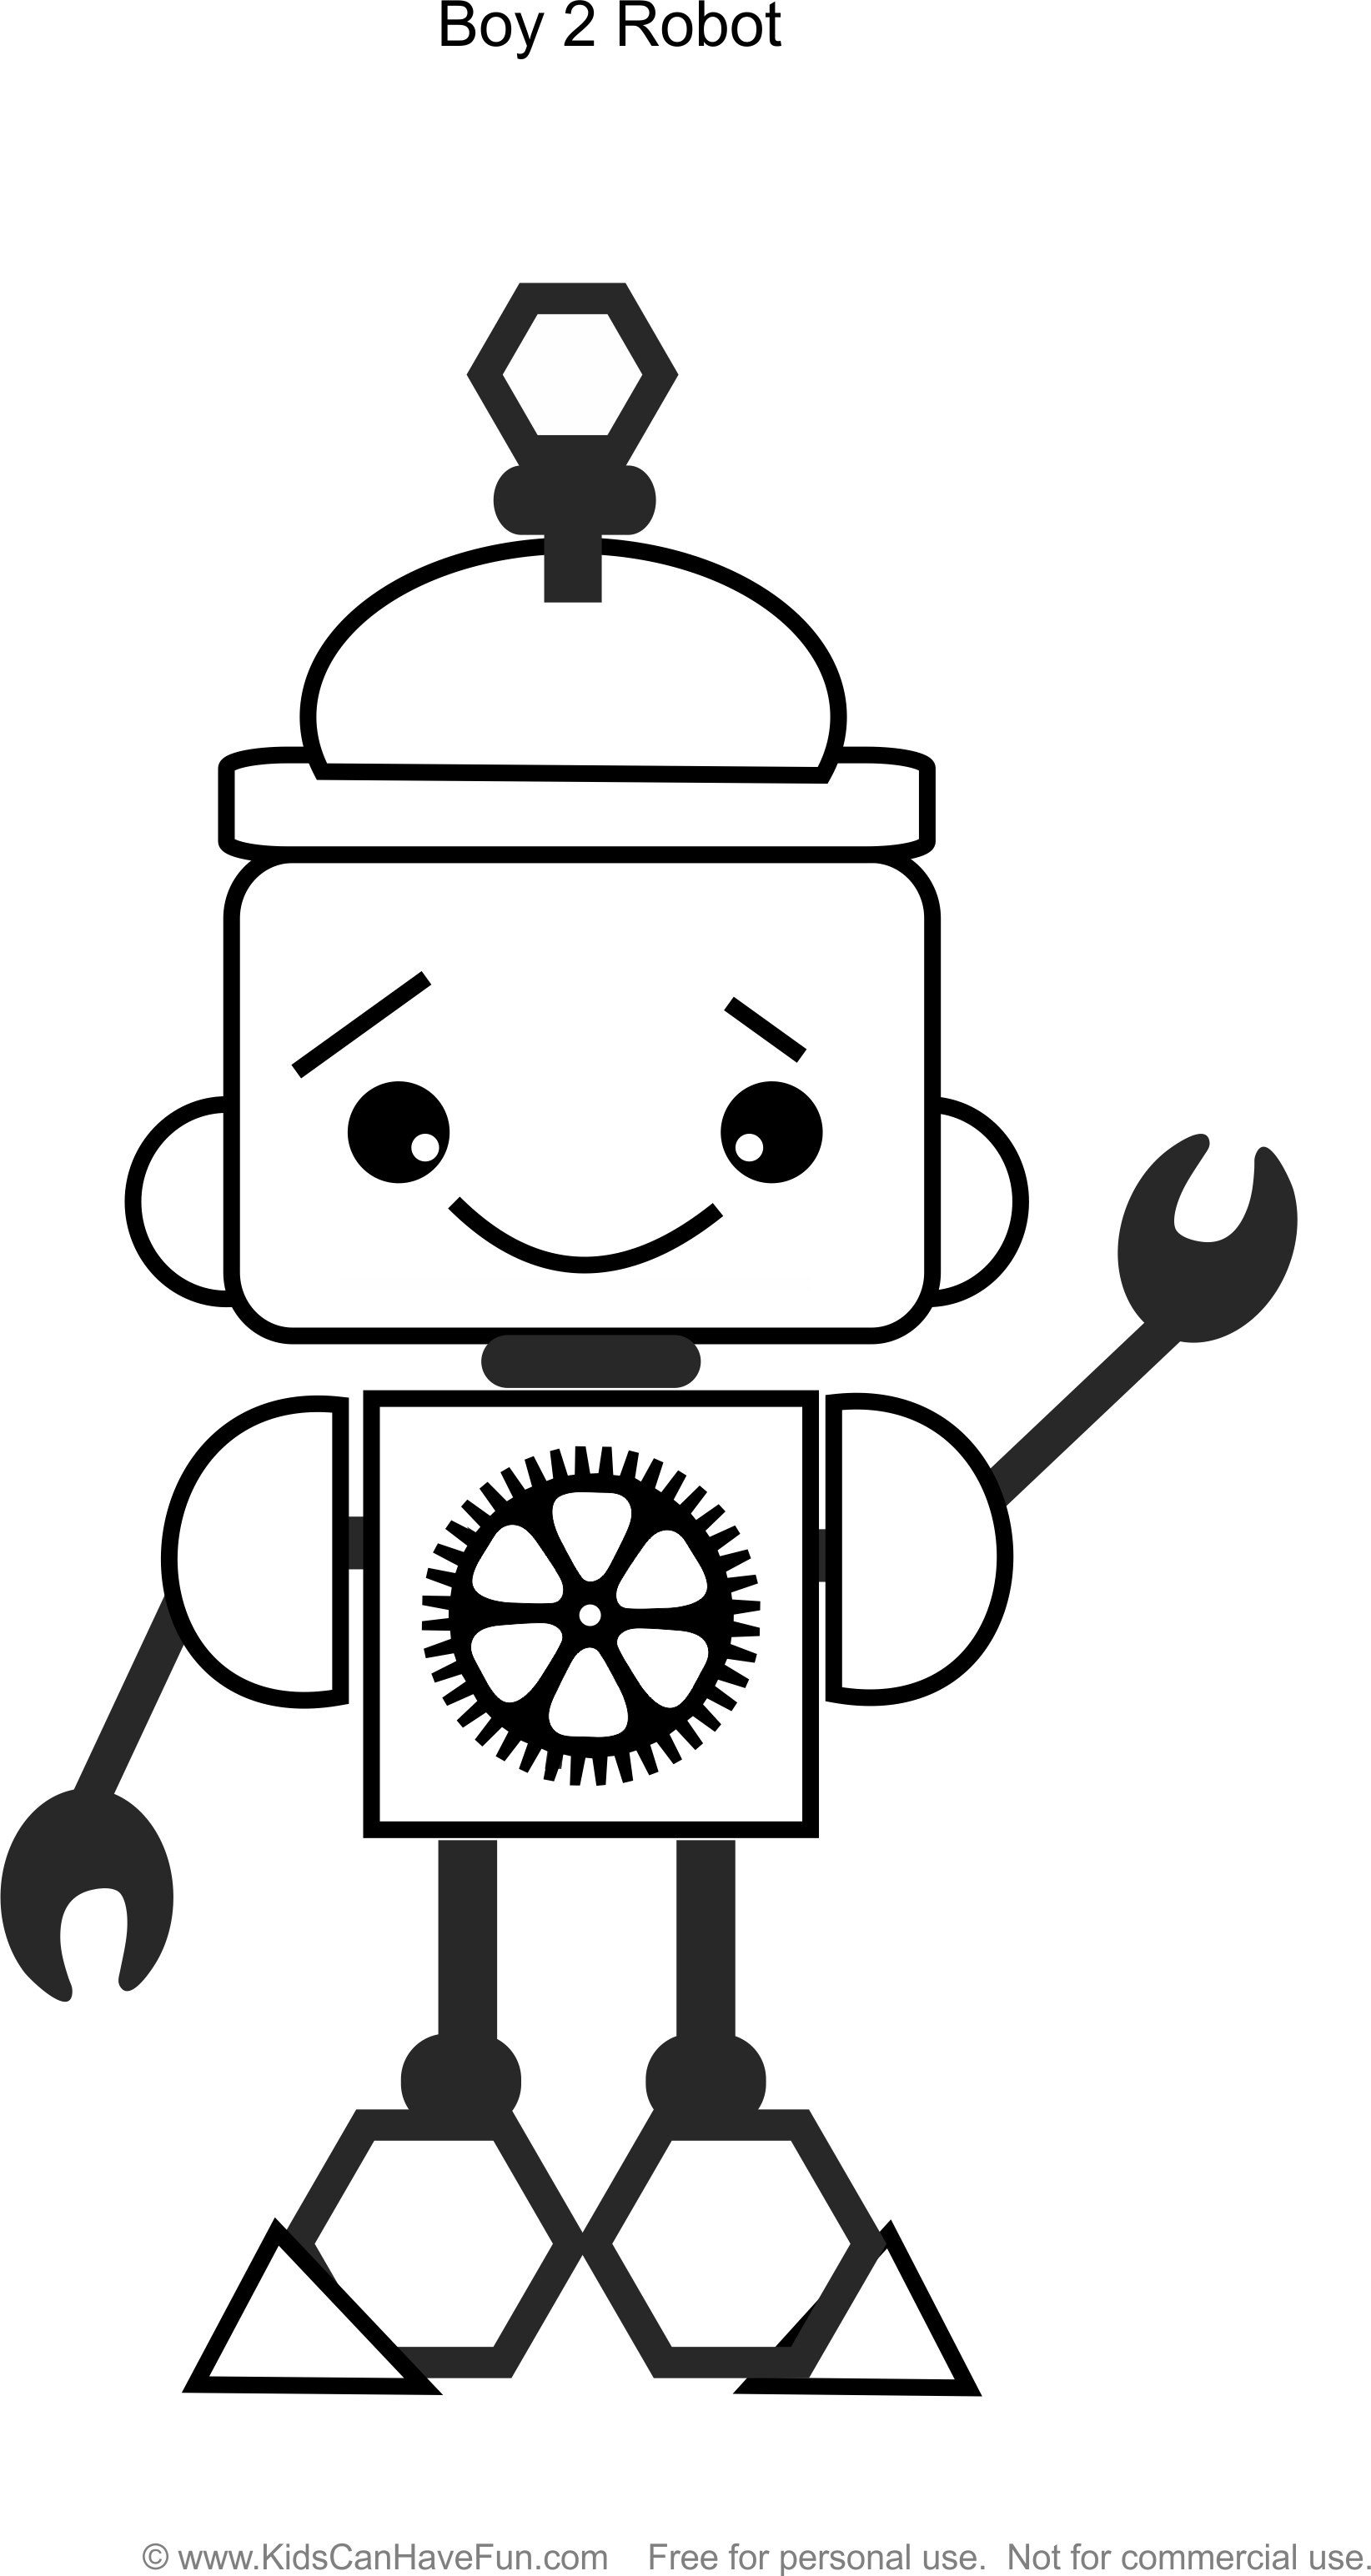 robot boy 2 coloring page http www kidscanhavefun com robot